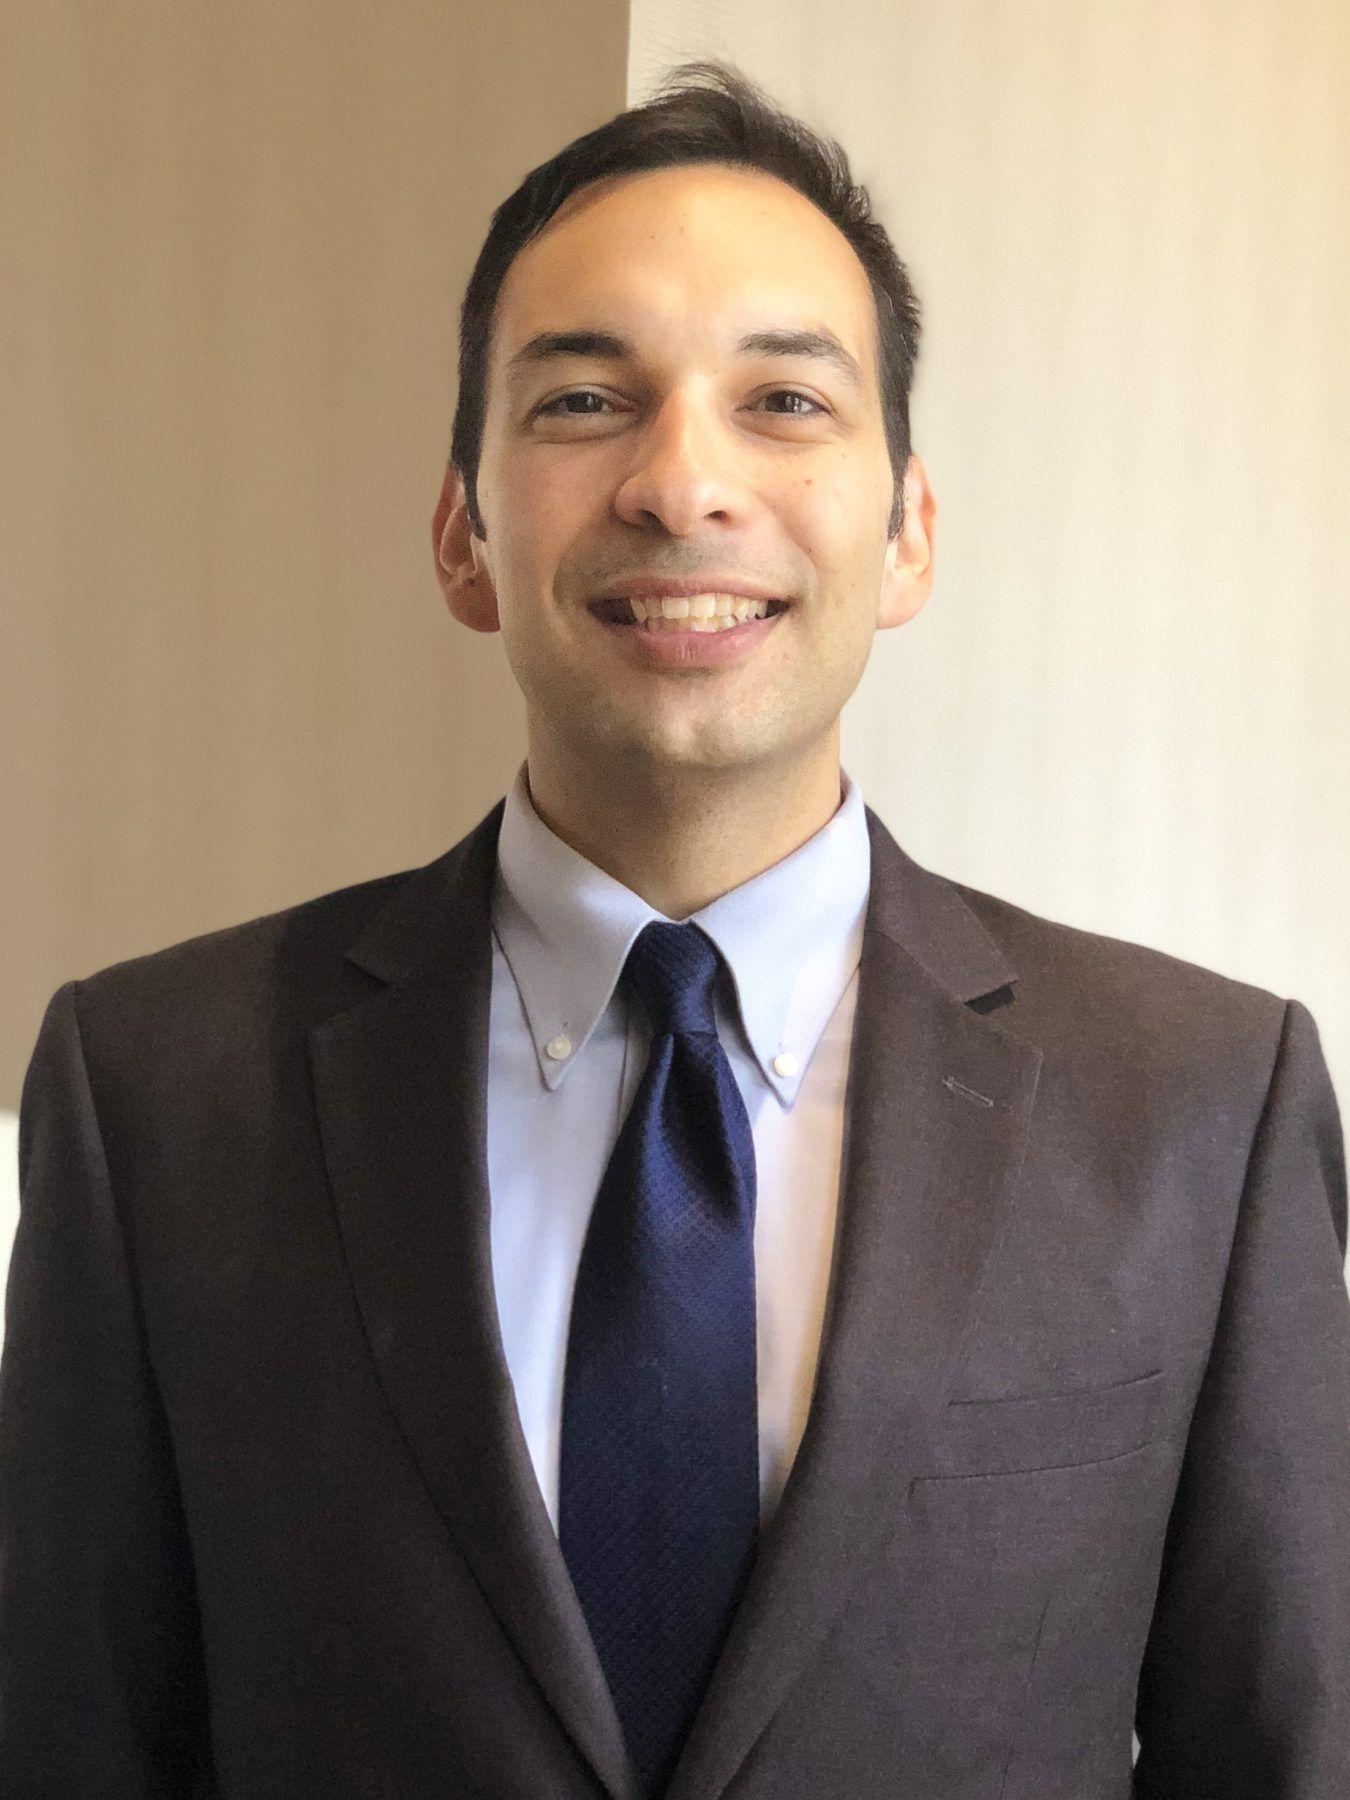 Fabian Corona, MS, OD